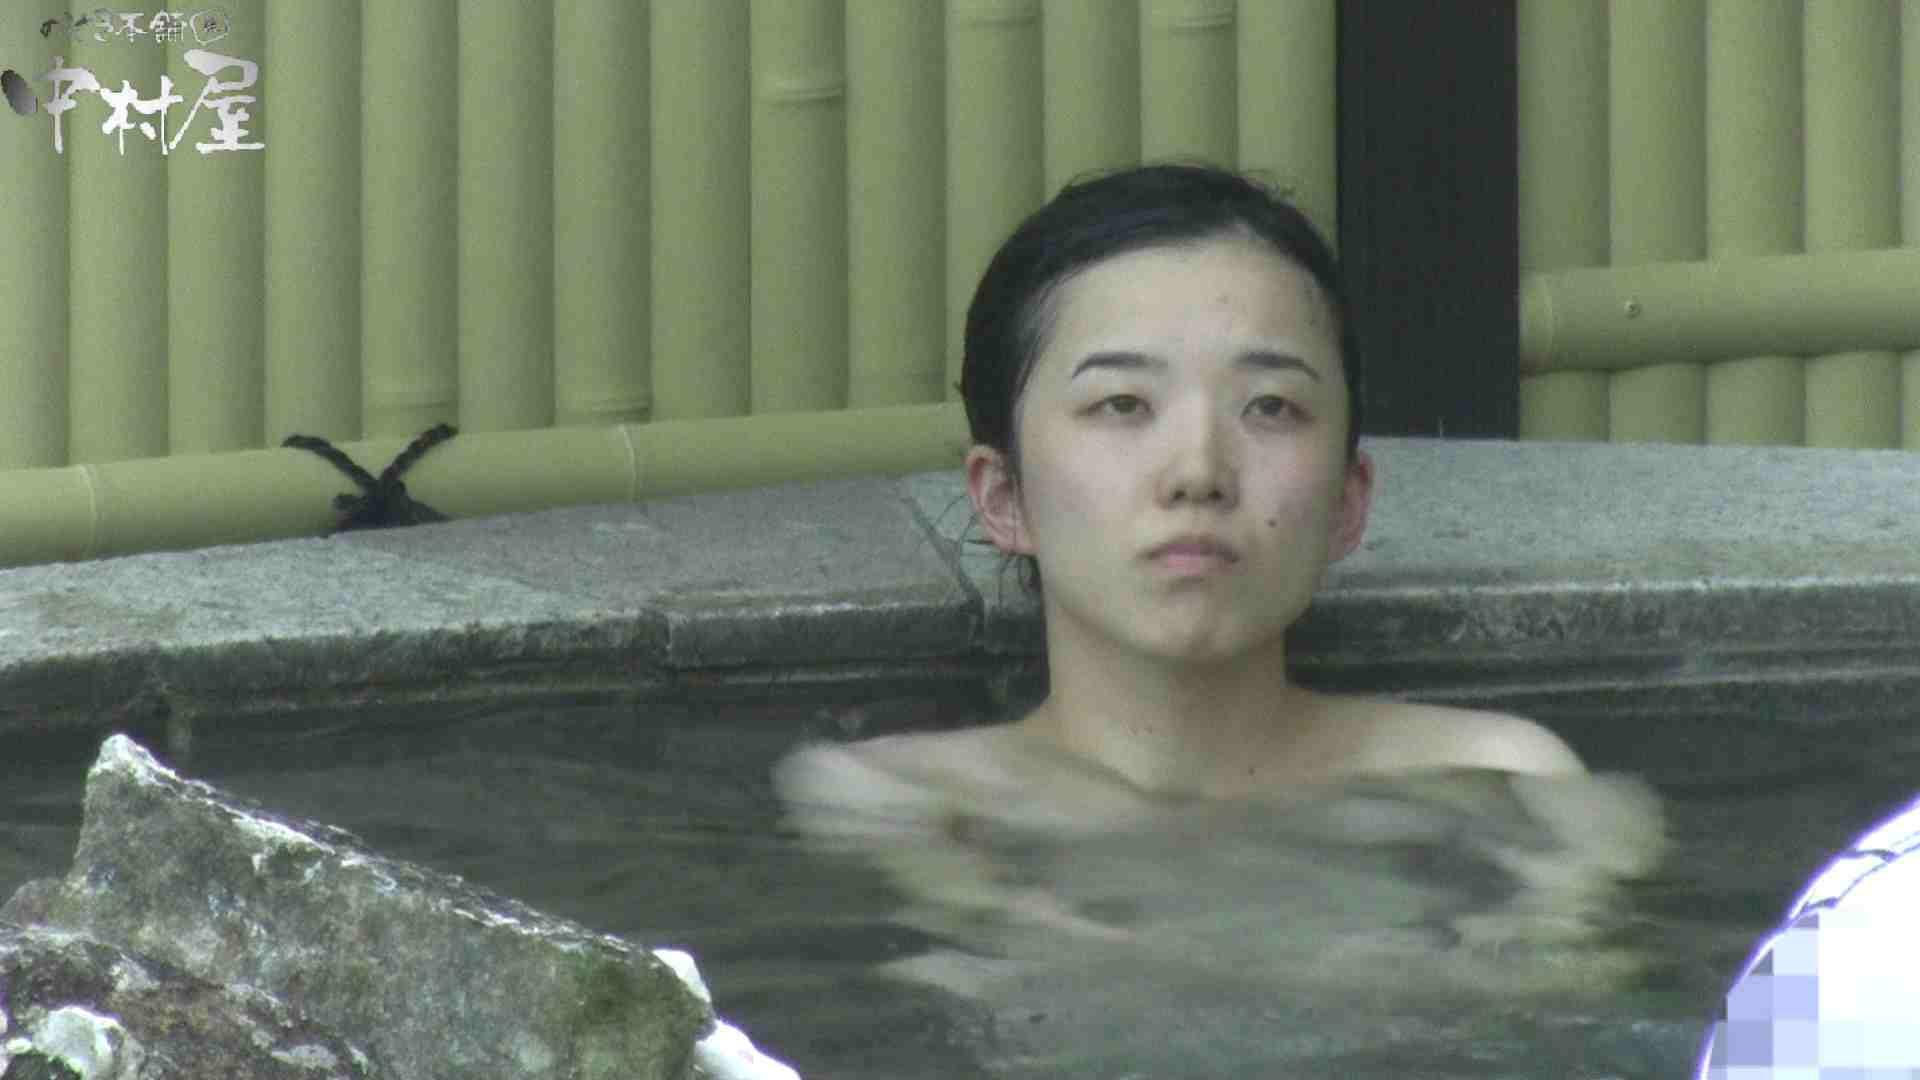 Aquaな露天風呂Vol.908 0 | 0  39連発 27